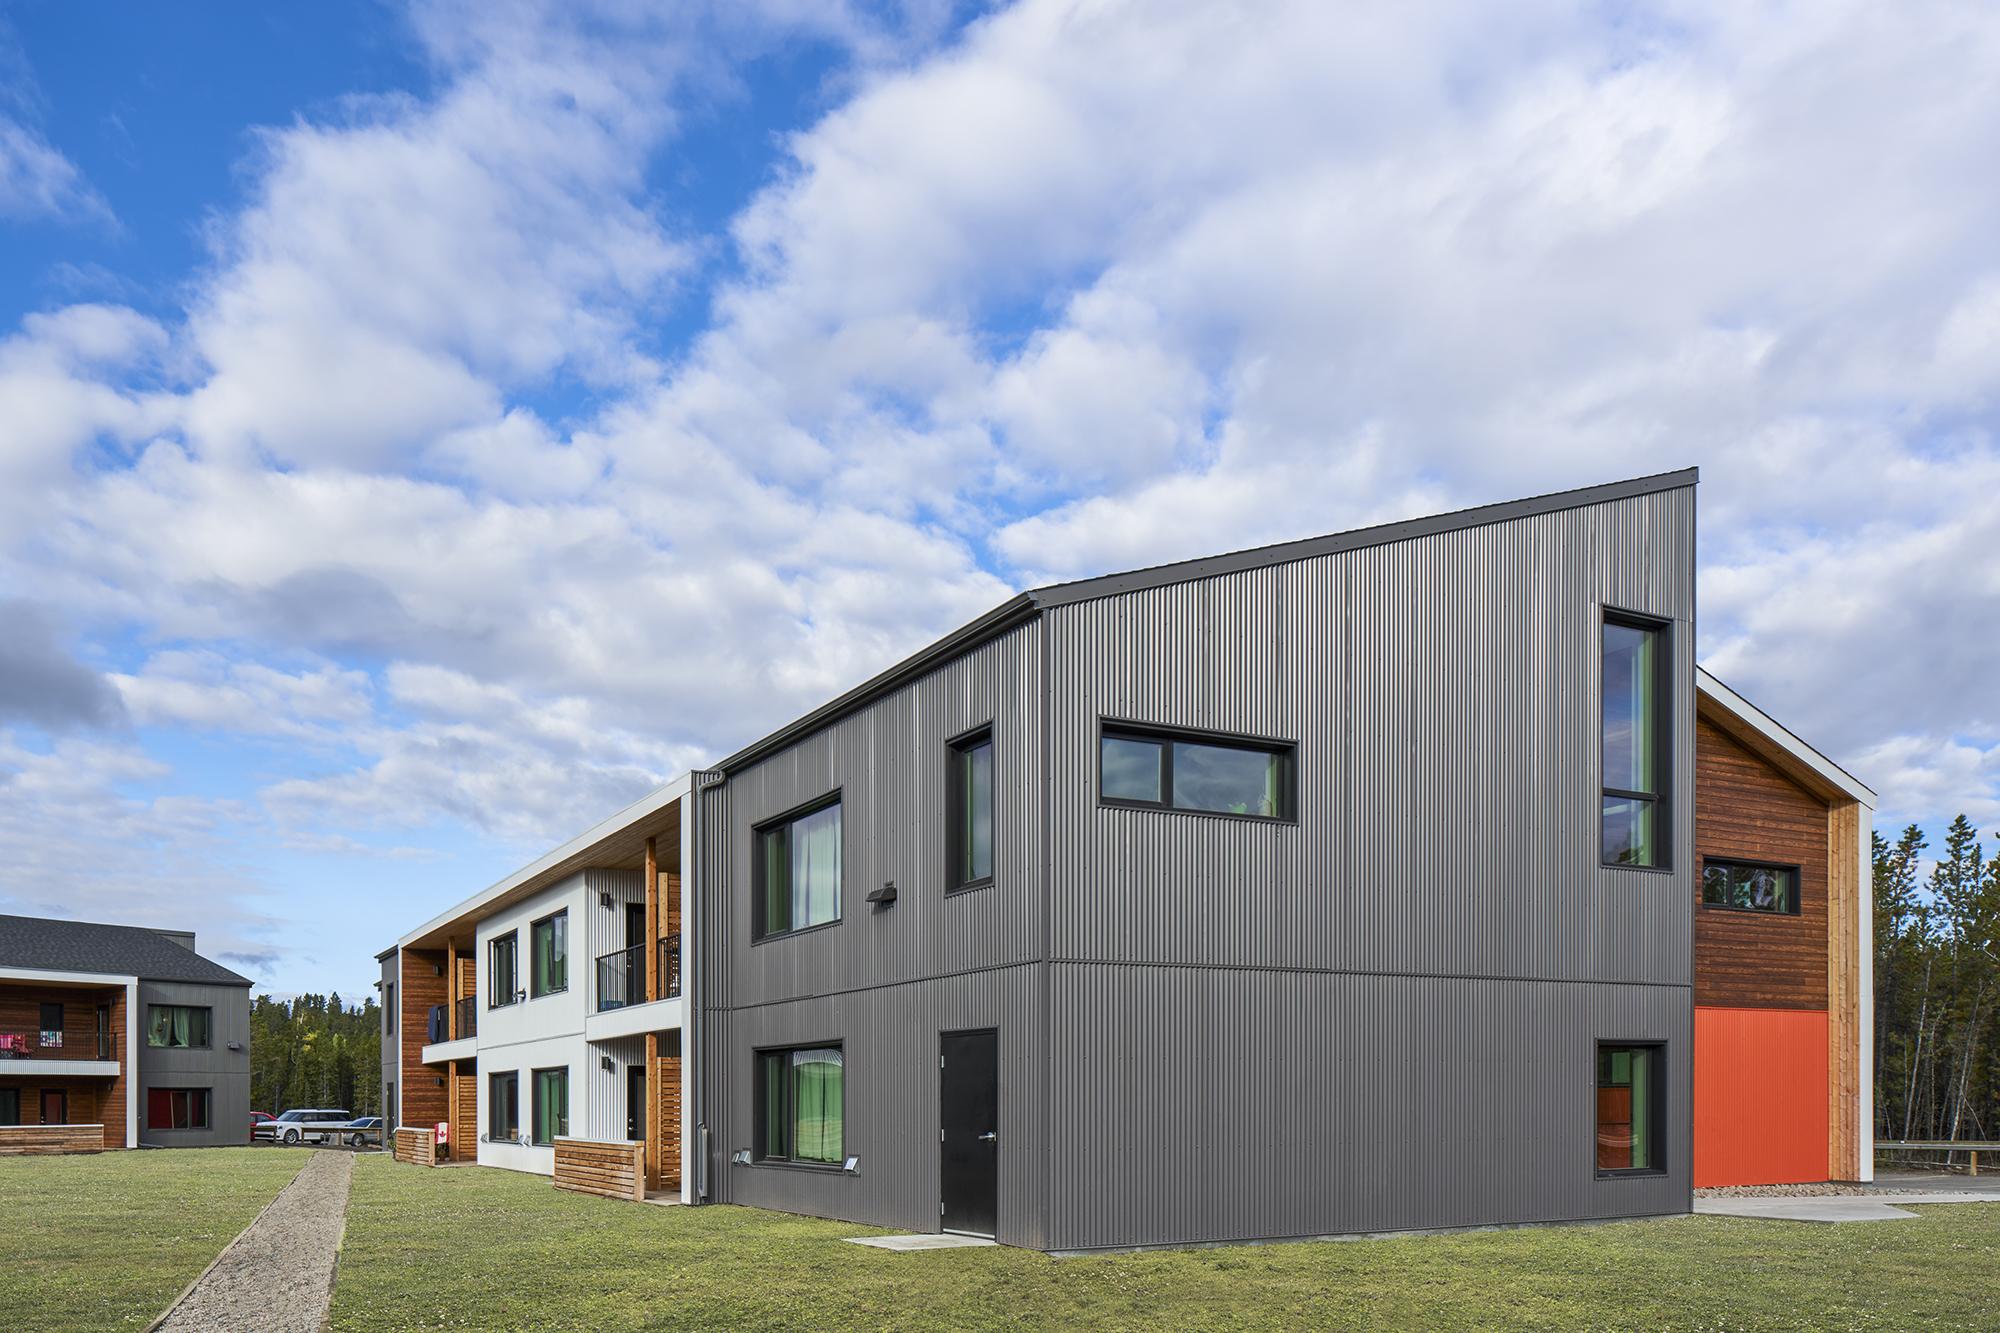 Riverbend Affordable Housing